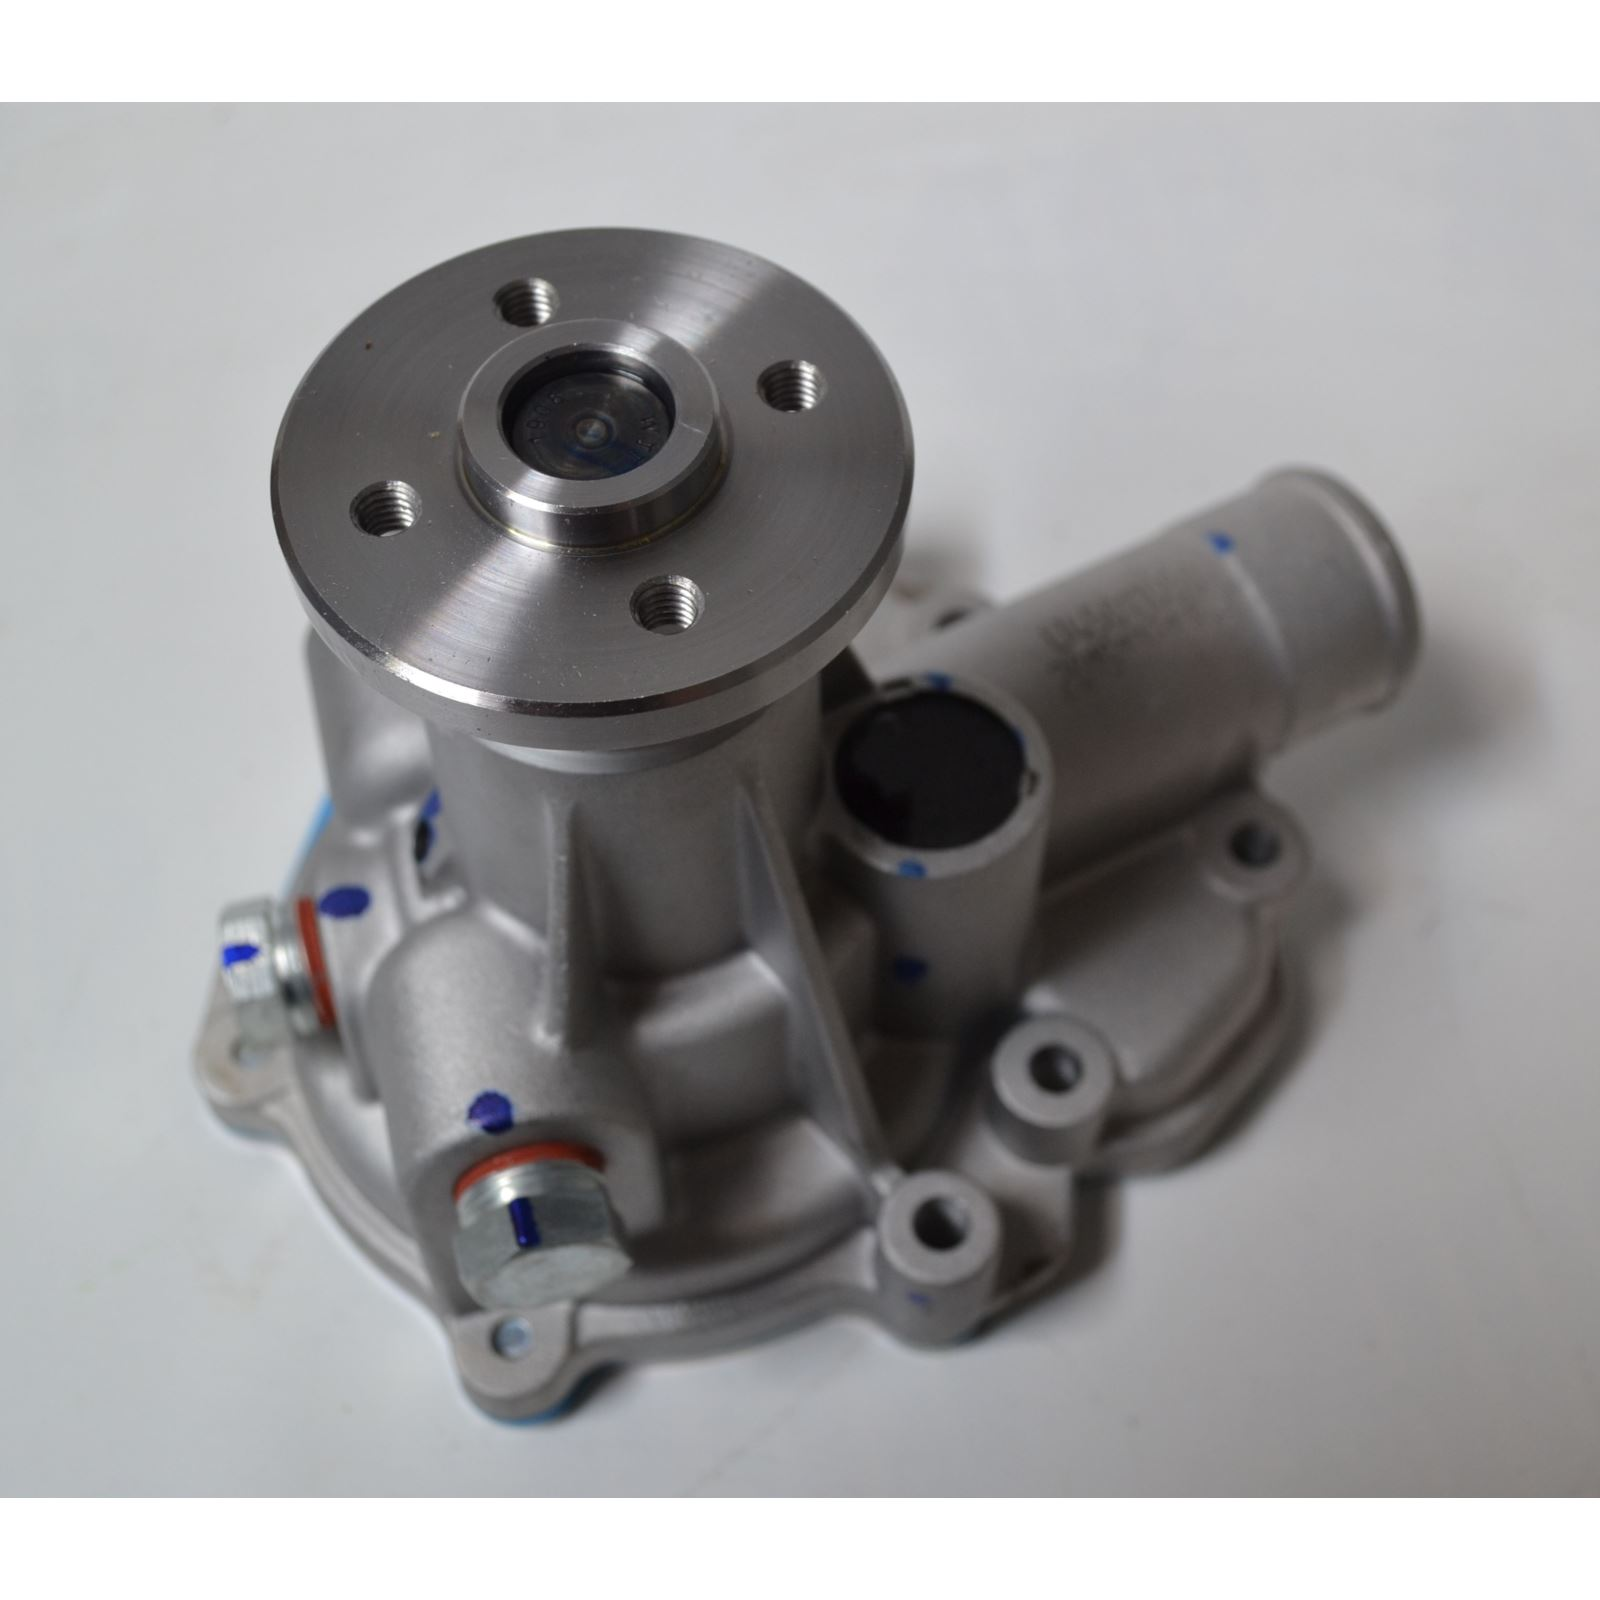 Pompa wody JCB 804 PLUS 802.7 PLUS KE HA HL HR